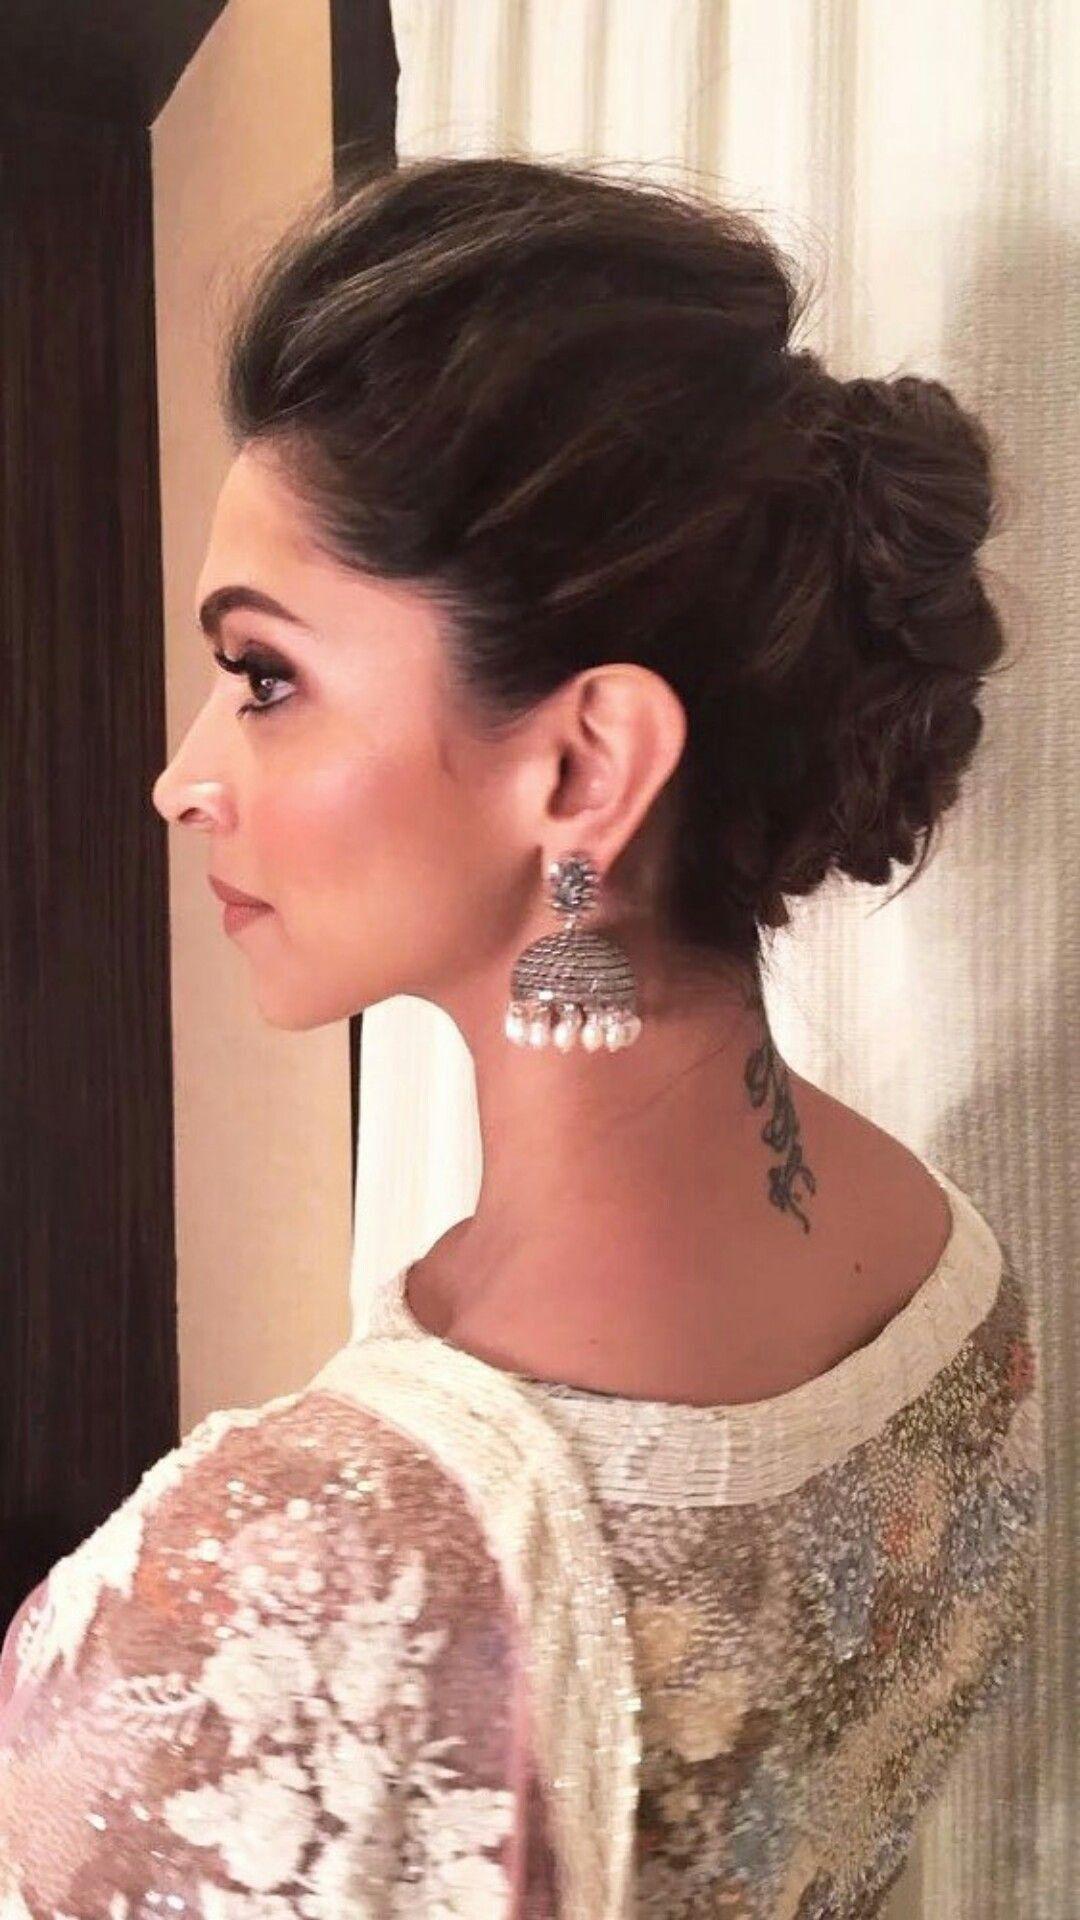 Wedding Hairstyles For Medium Hair Indian Trumpet 55 Hairstyles For Indian Weddings Medium In 2020 Hair Styles Wedding Hairstyles For Medium Hair Medium Hair Styles